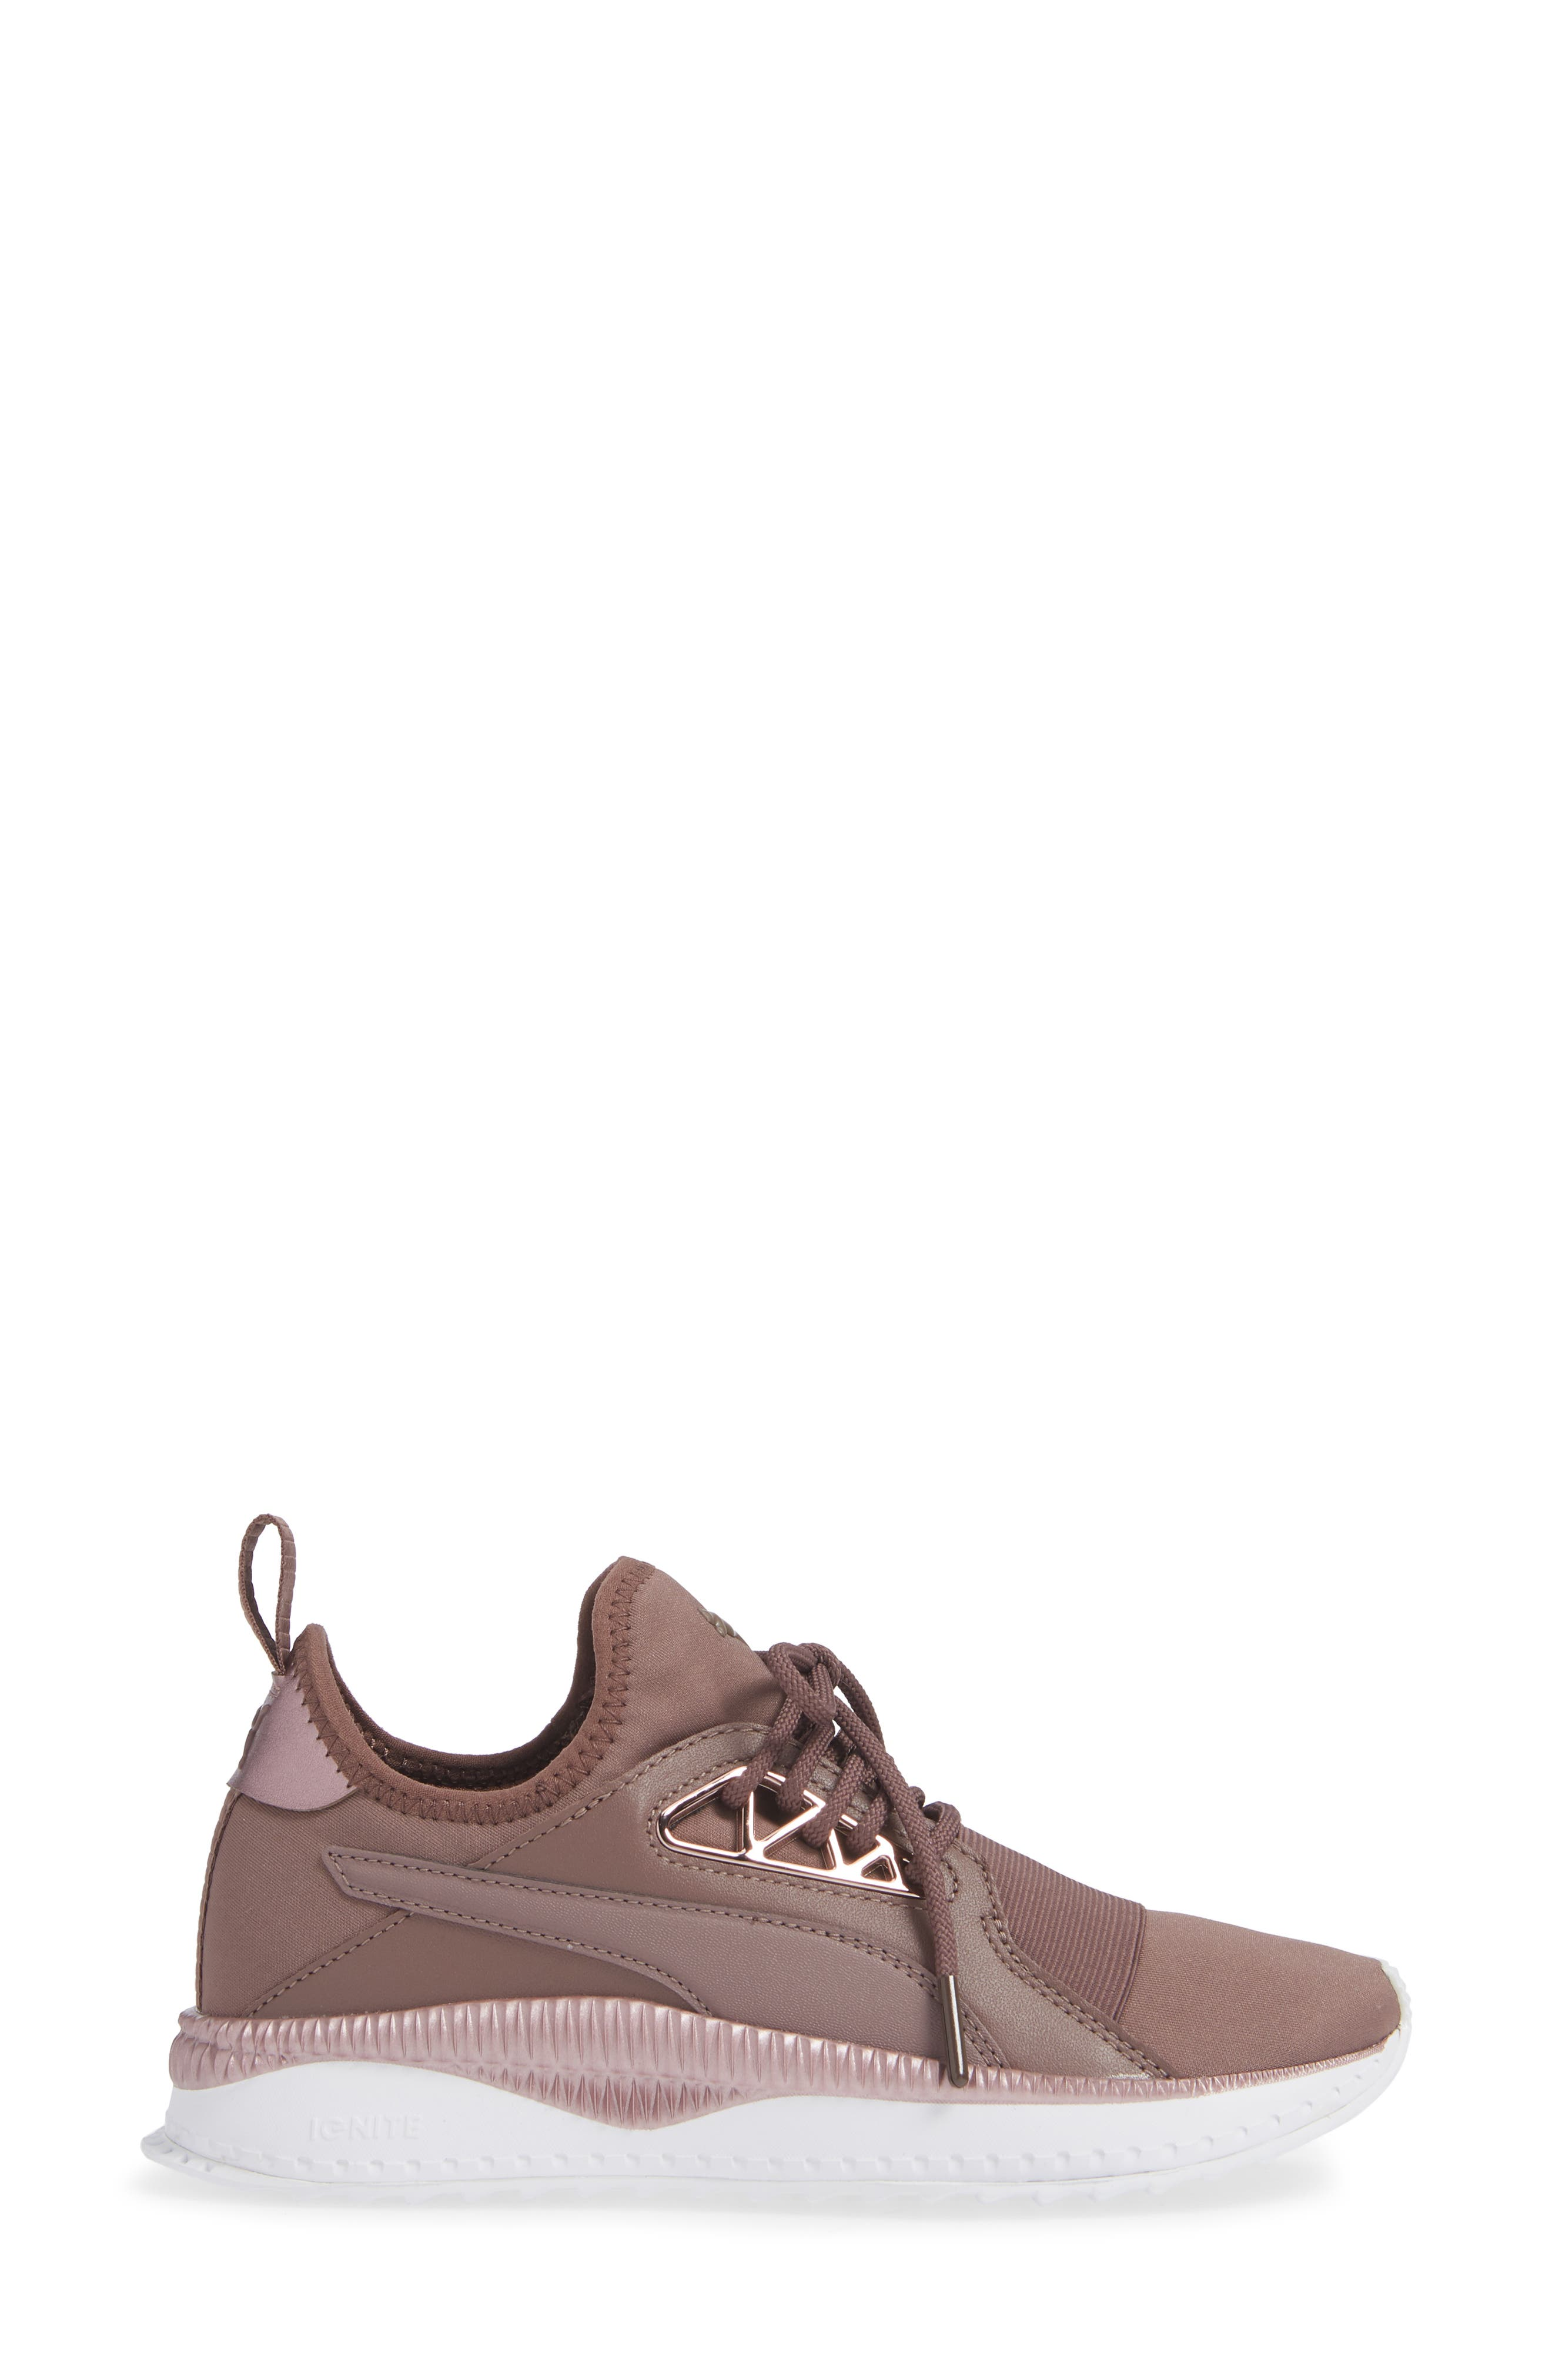 PUMA, TSUGI Apex Jewel Sneaker, Alternate thumbnail 3, color, PEPPERCORN/ PEPPERCORN